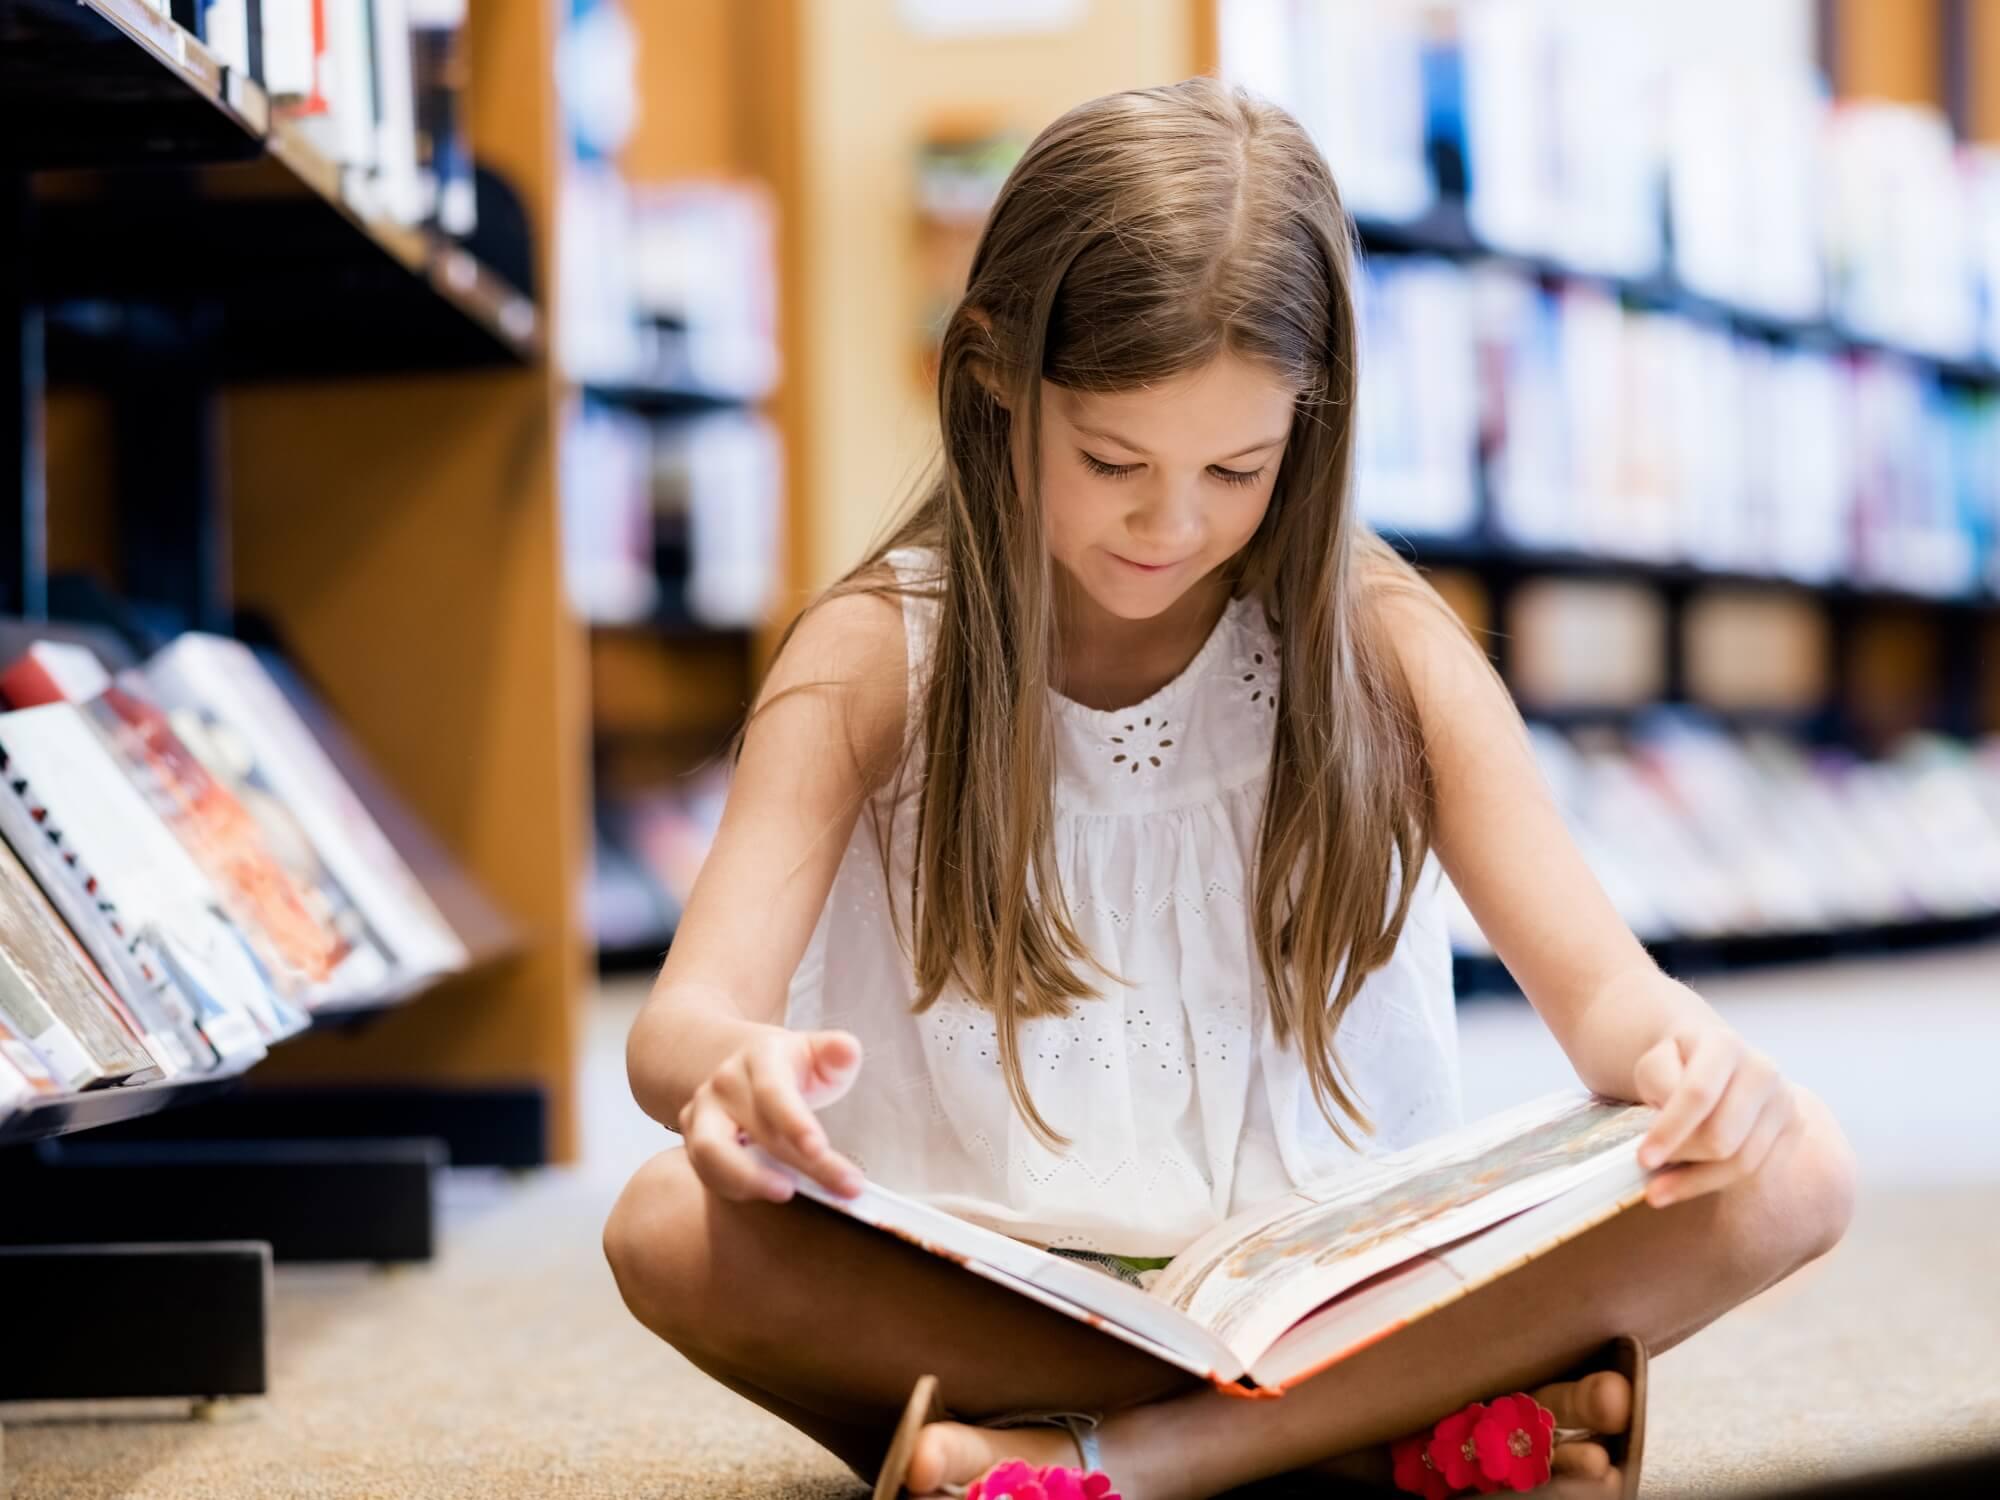 Sabine loves reading